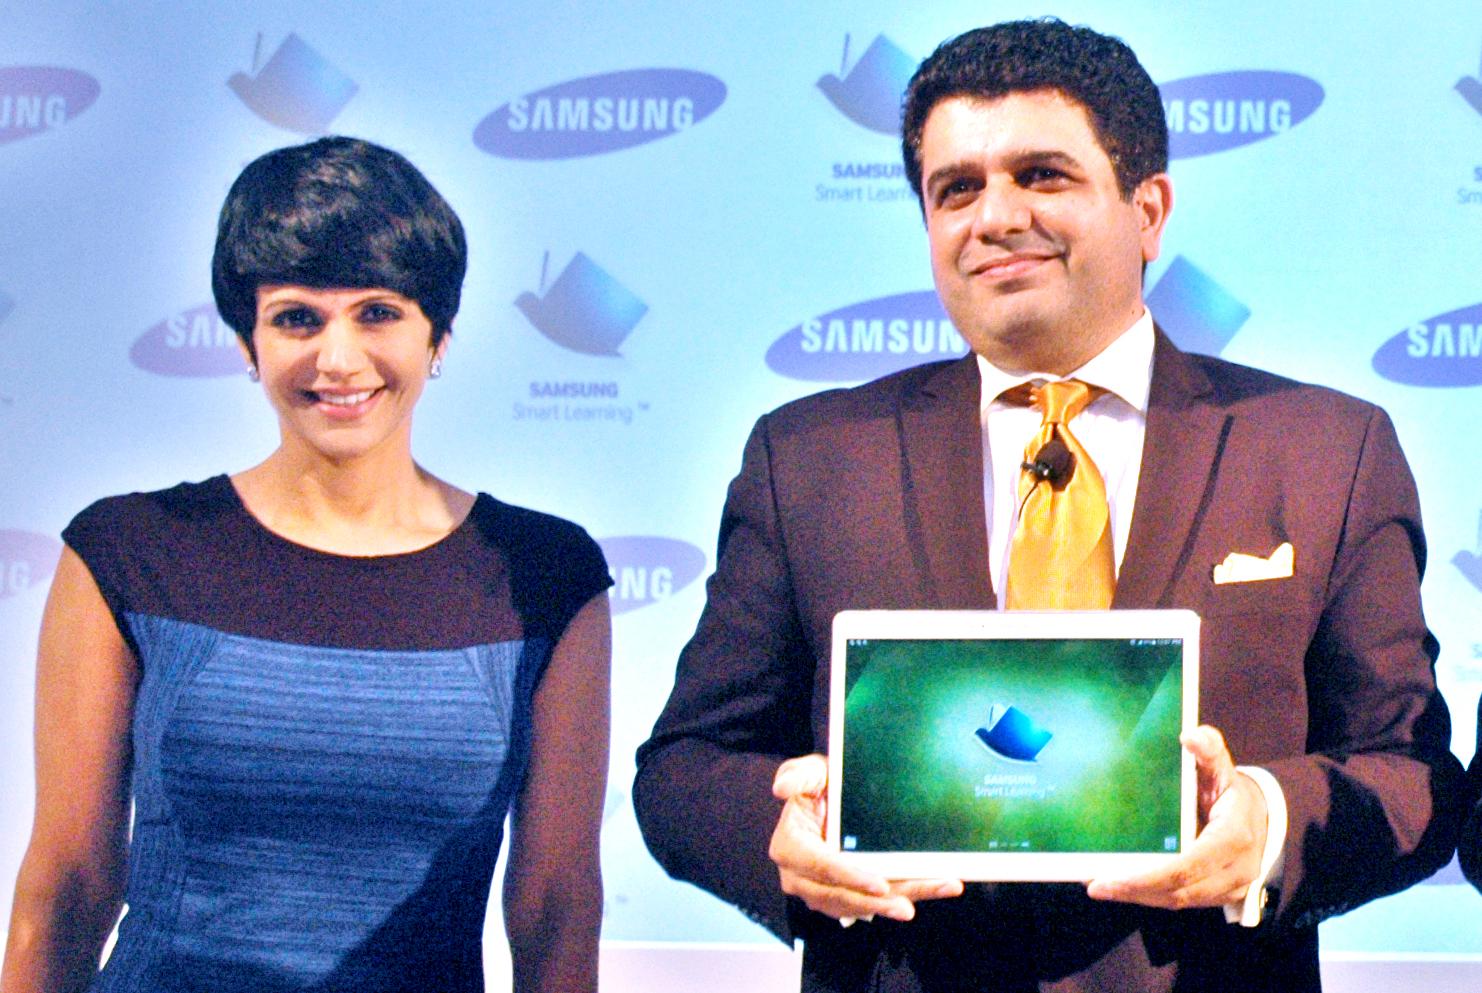 Actress Mandira Bedi and Tarun Mallik launch of Samsung's Smart learning initiative